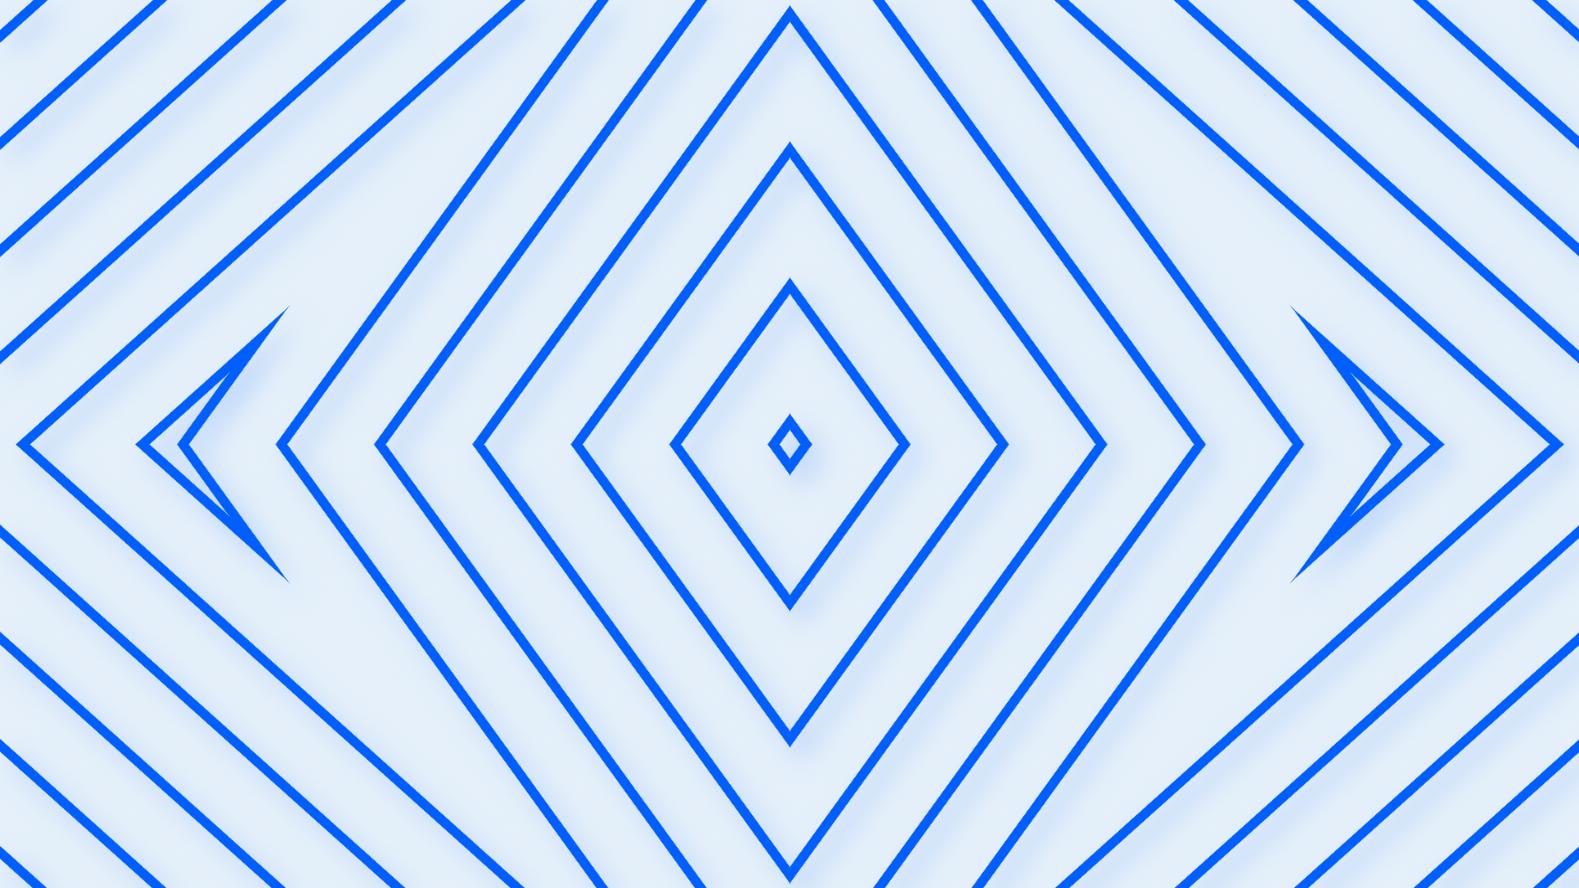 blue_introB_5994.216173.png